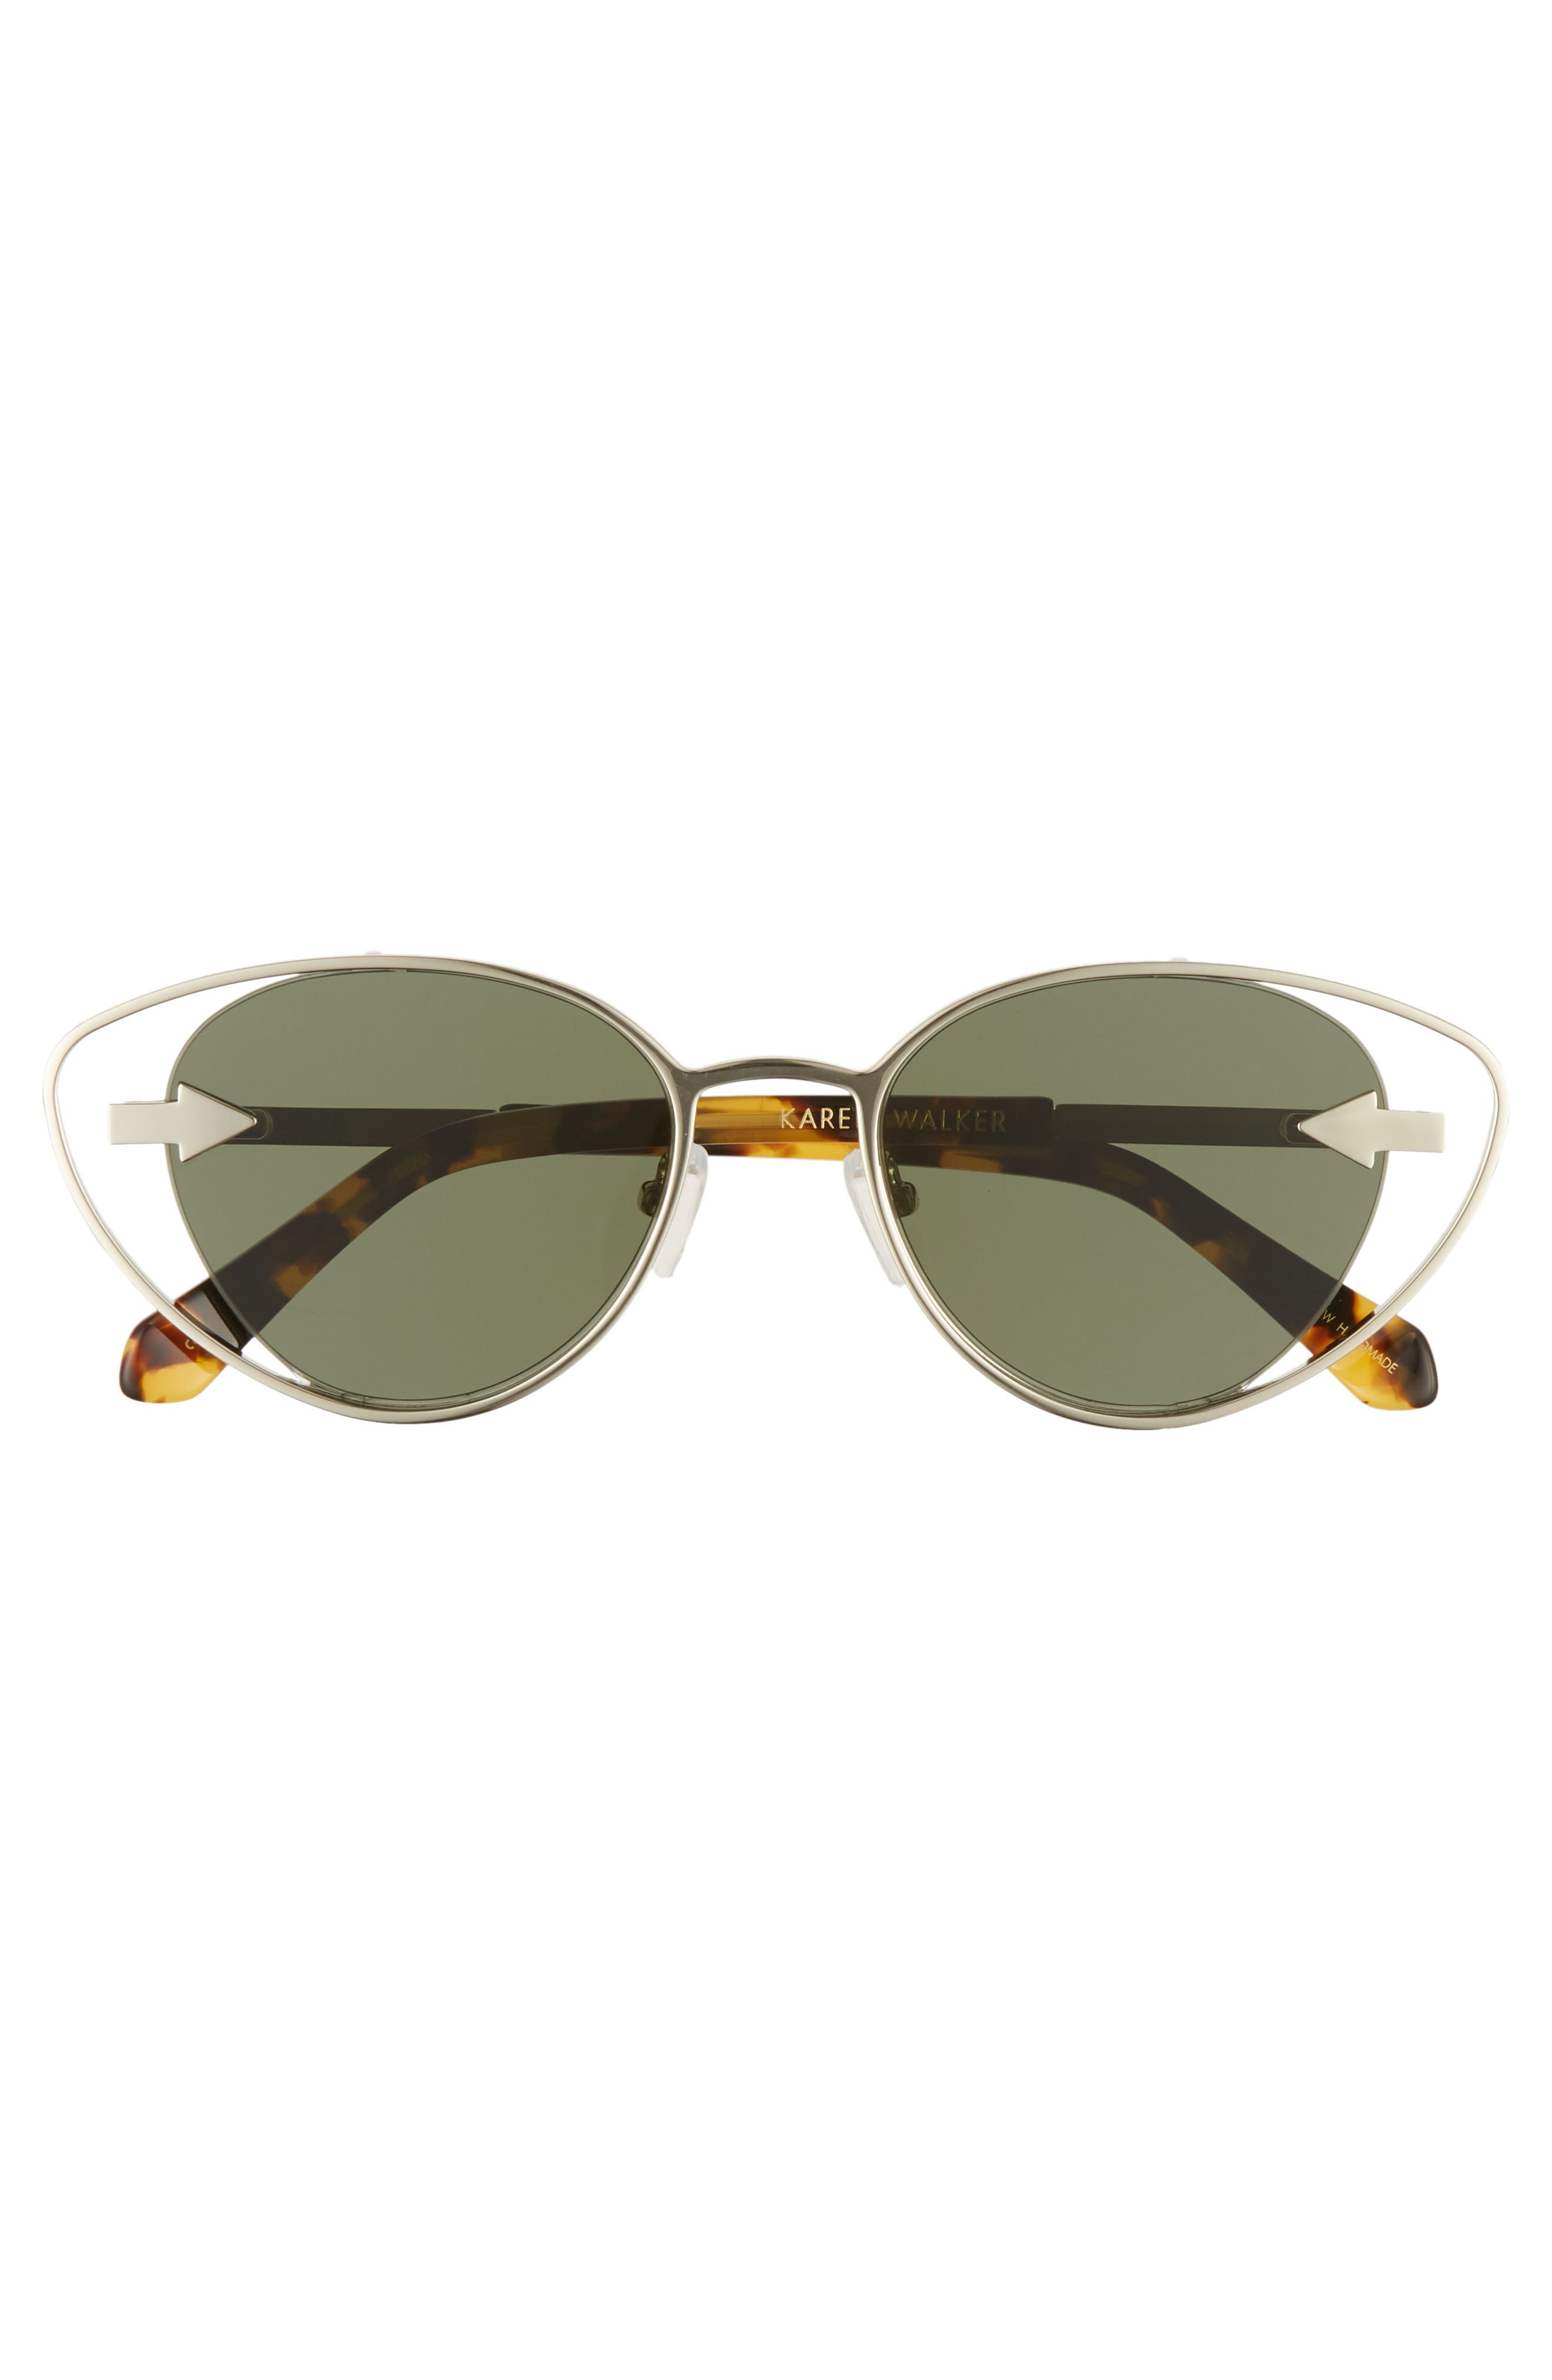 Kissy Kissy 51mm Cat Eye Sunglasses,                             Alternate thumbnail 3, color,                             GOLD/ TORTOISE